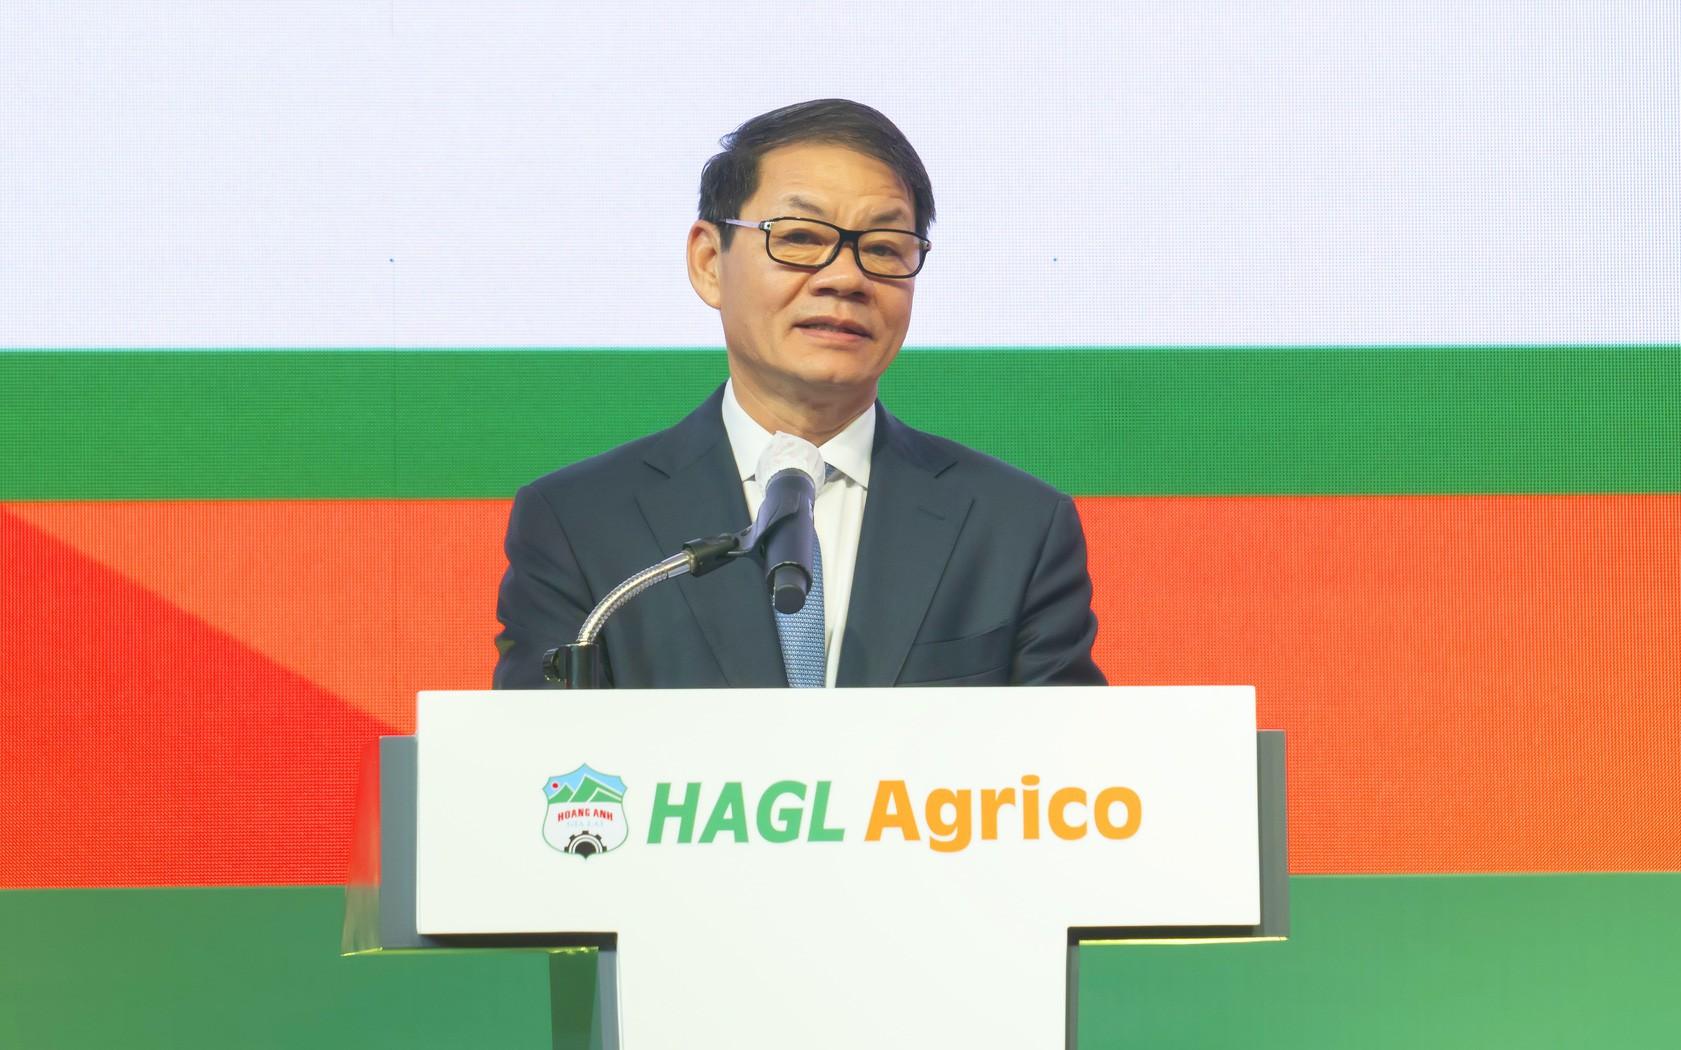 ong-tran-ba-duong-cho-rang-dam-nhiem-vi-tri-chu-tich-hagl-agrico-1610202562243315891430-crop-16102025909641532497022-1627051684.jpeg